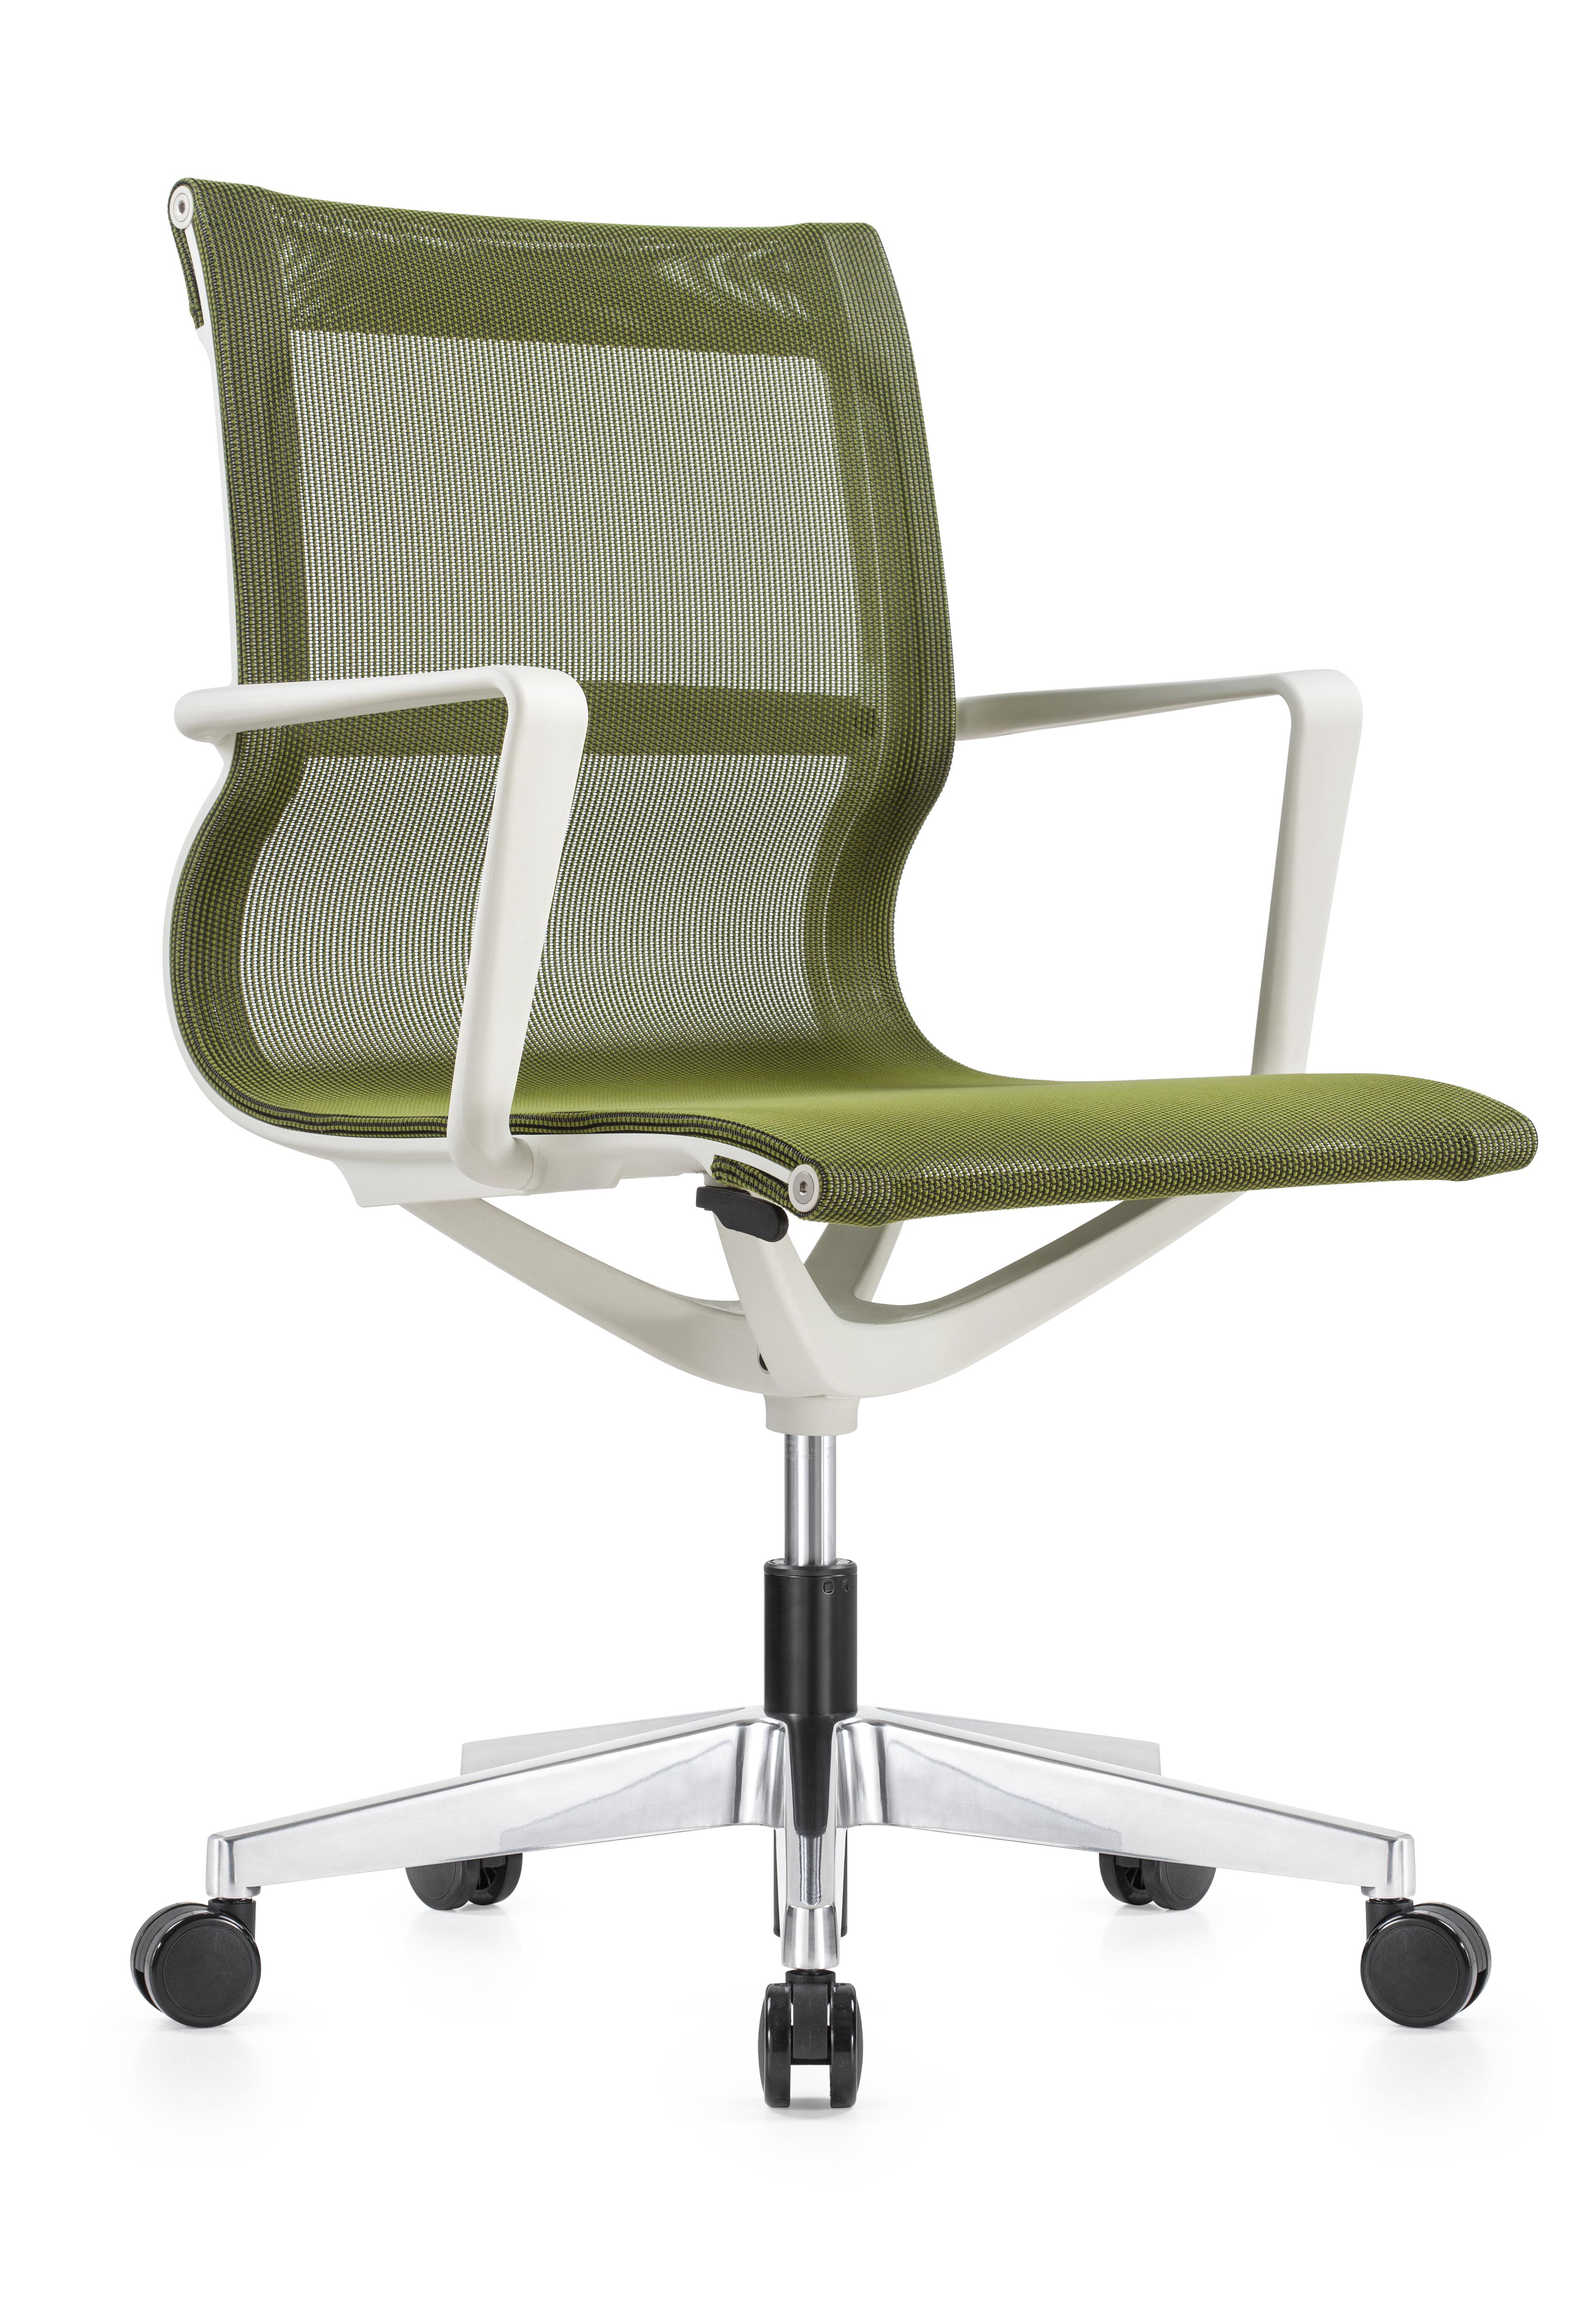 kinetic chair - green